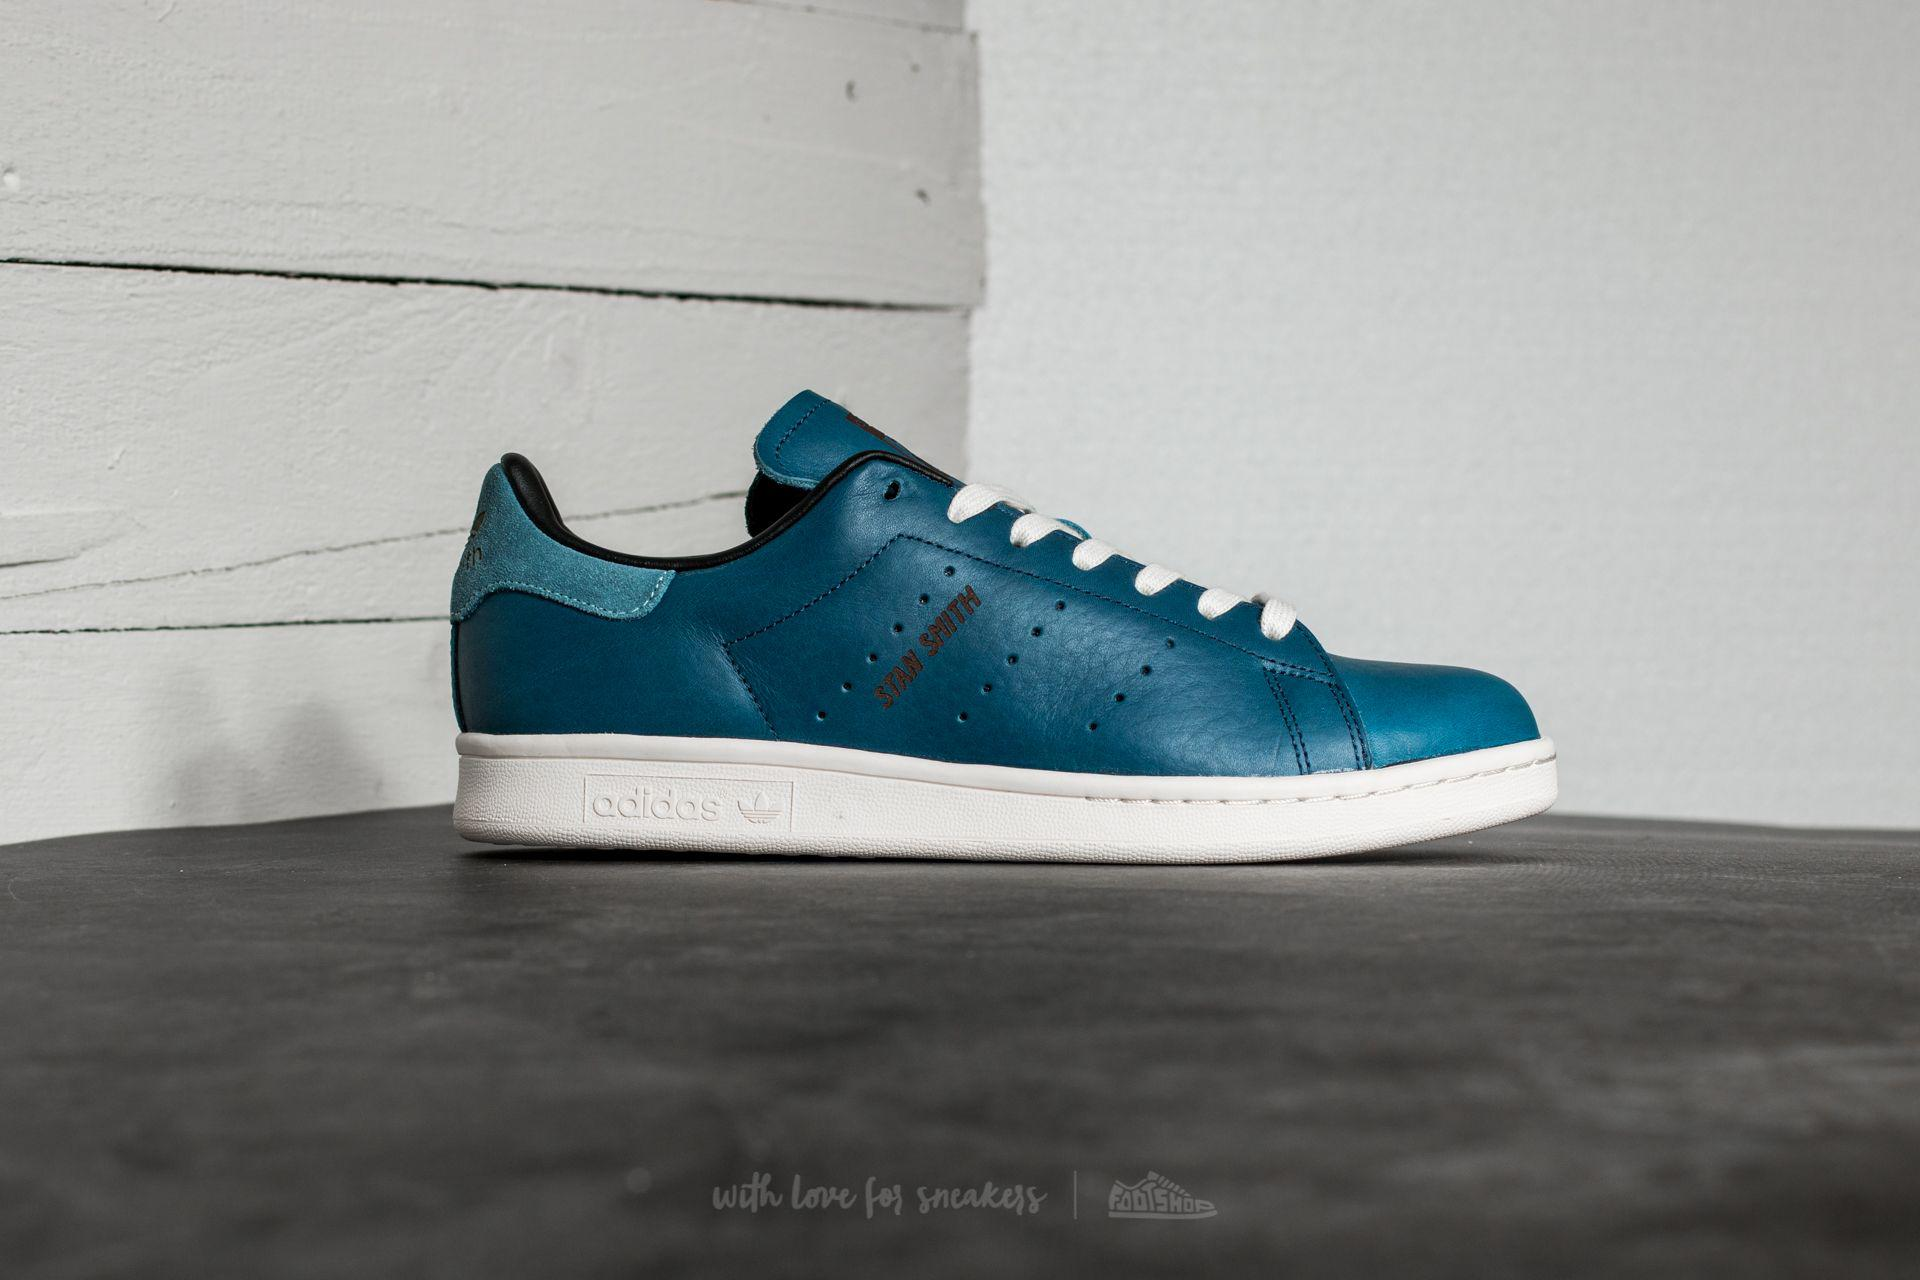 Lyst - adidas Originals Adidas Stan Smith Blue  Collegiate Navy ... bd9817225